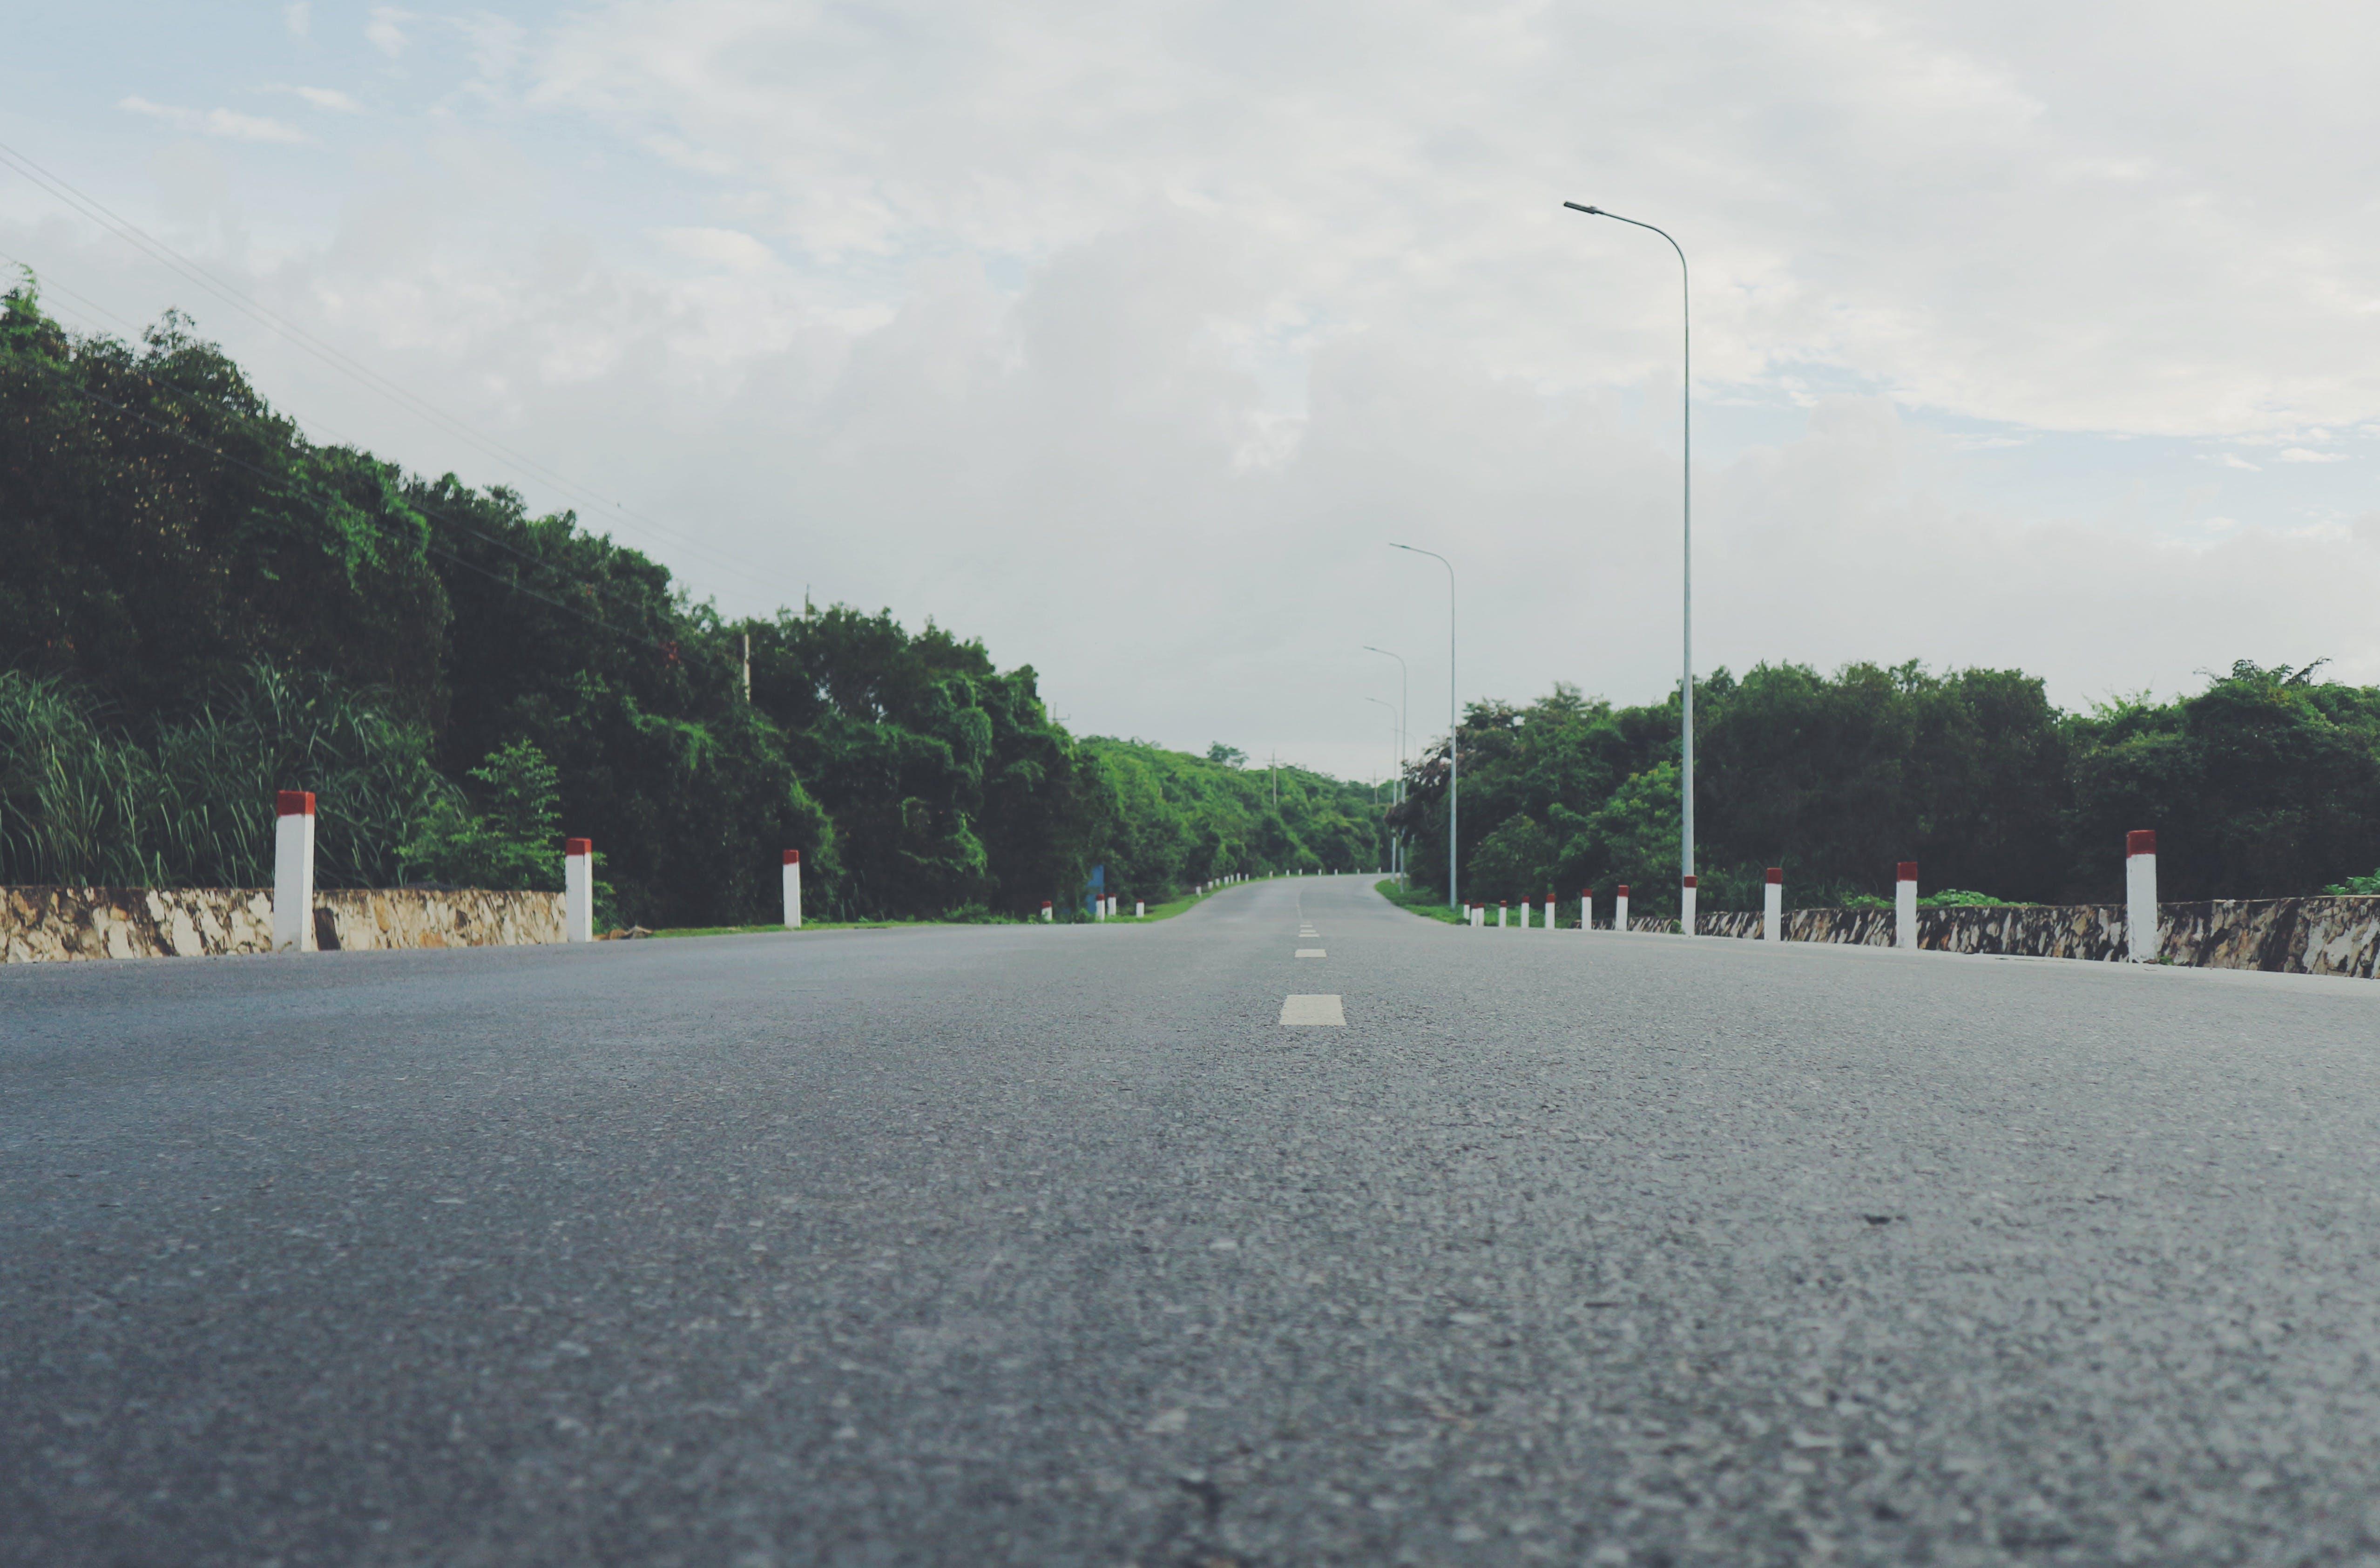 Gratis arkivbilde med asfalt, hovedvei, landskap, trær